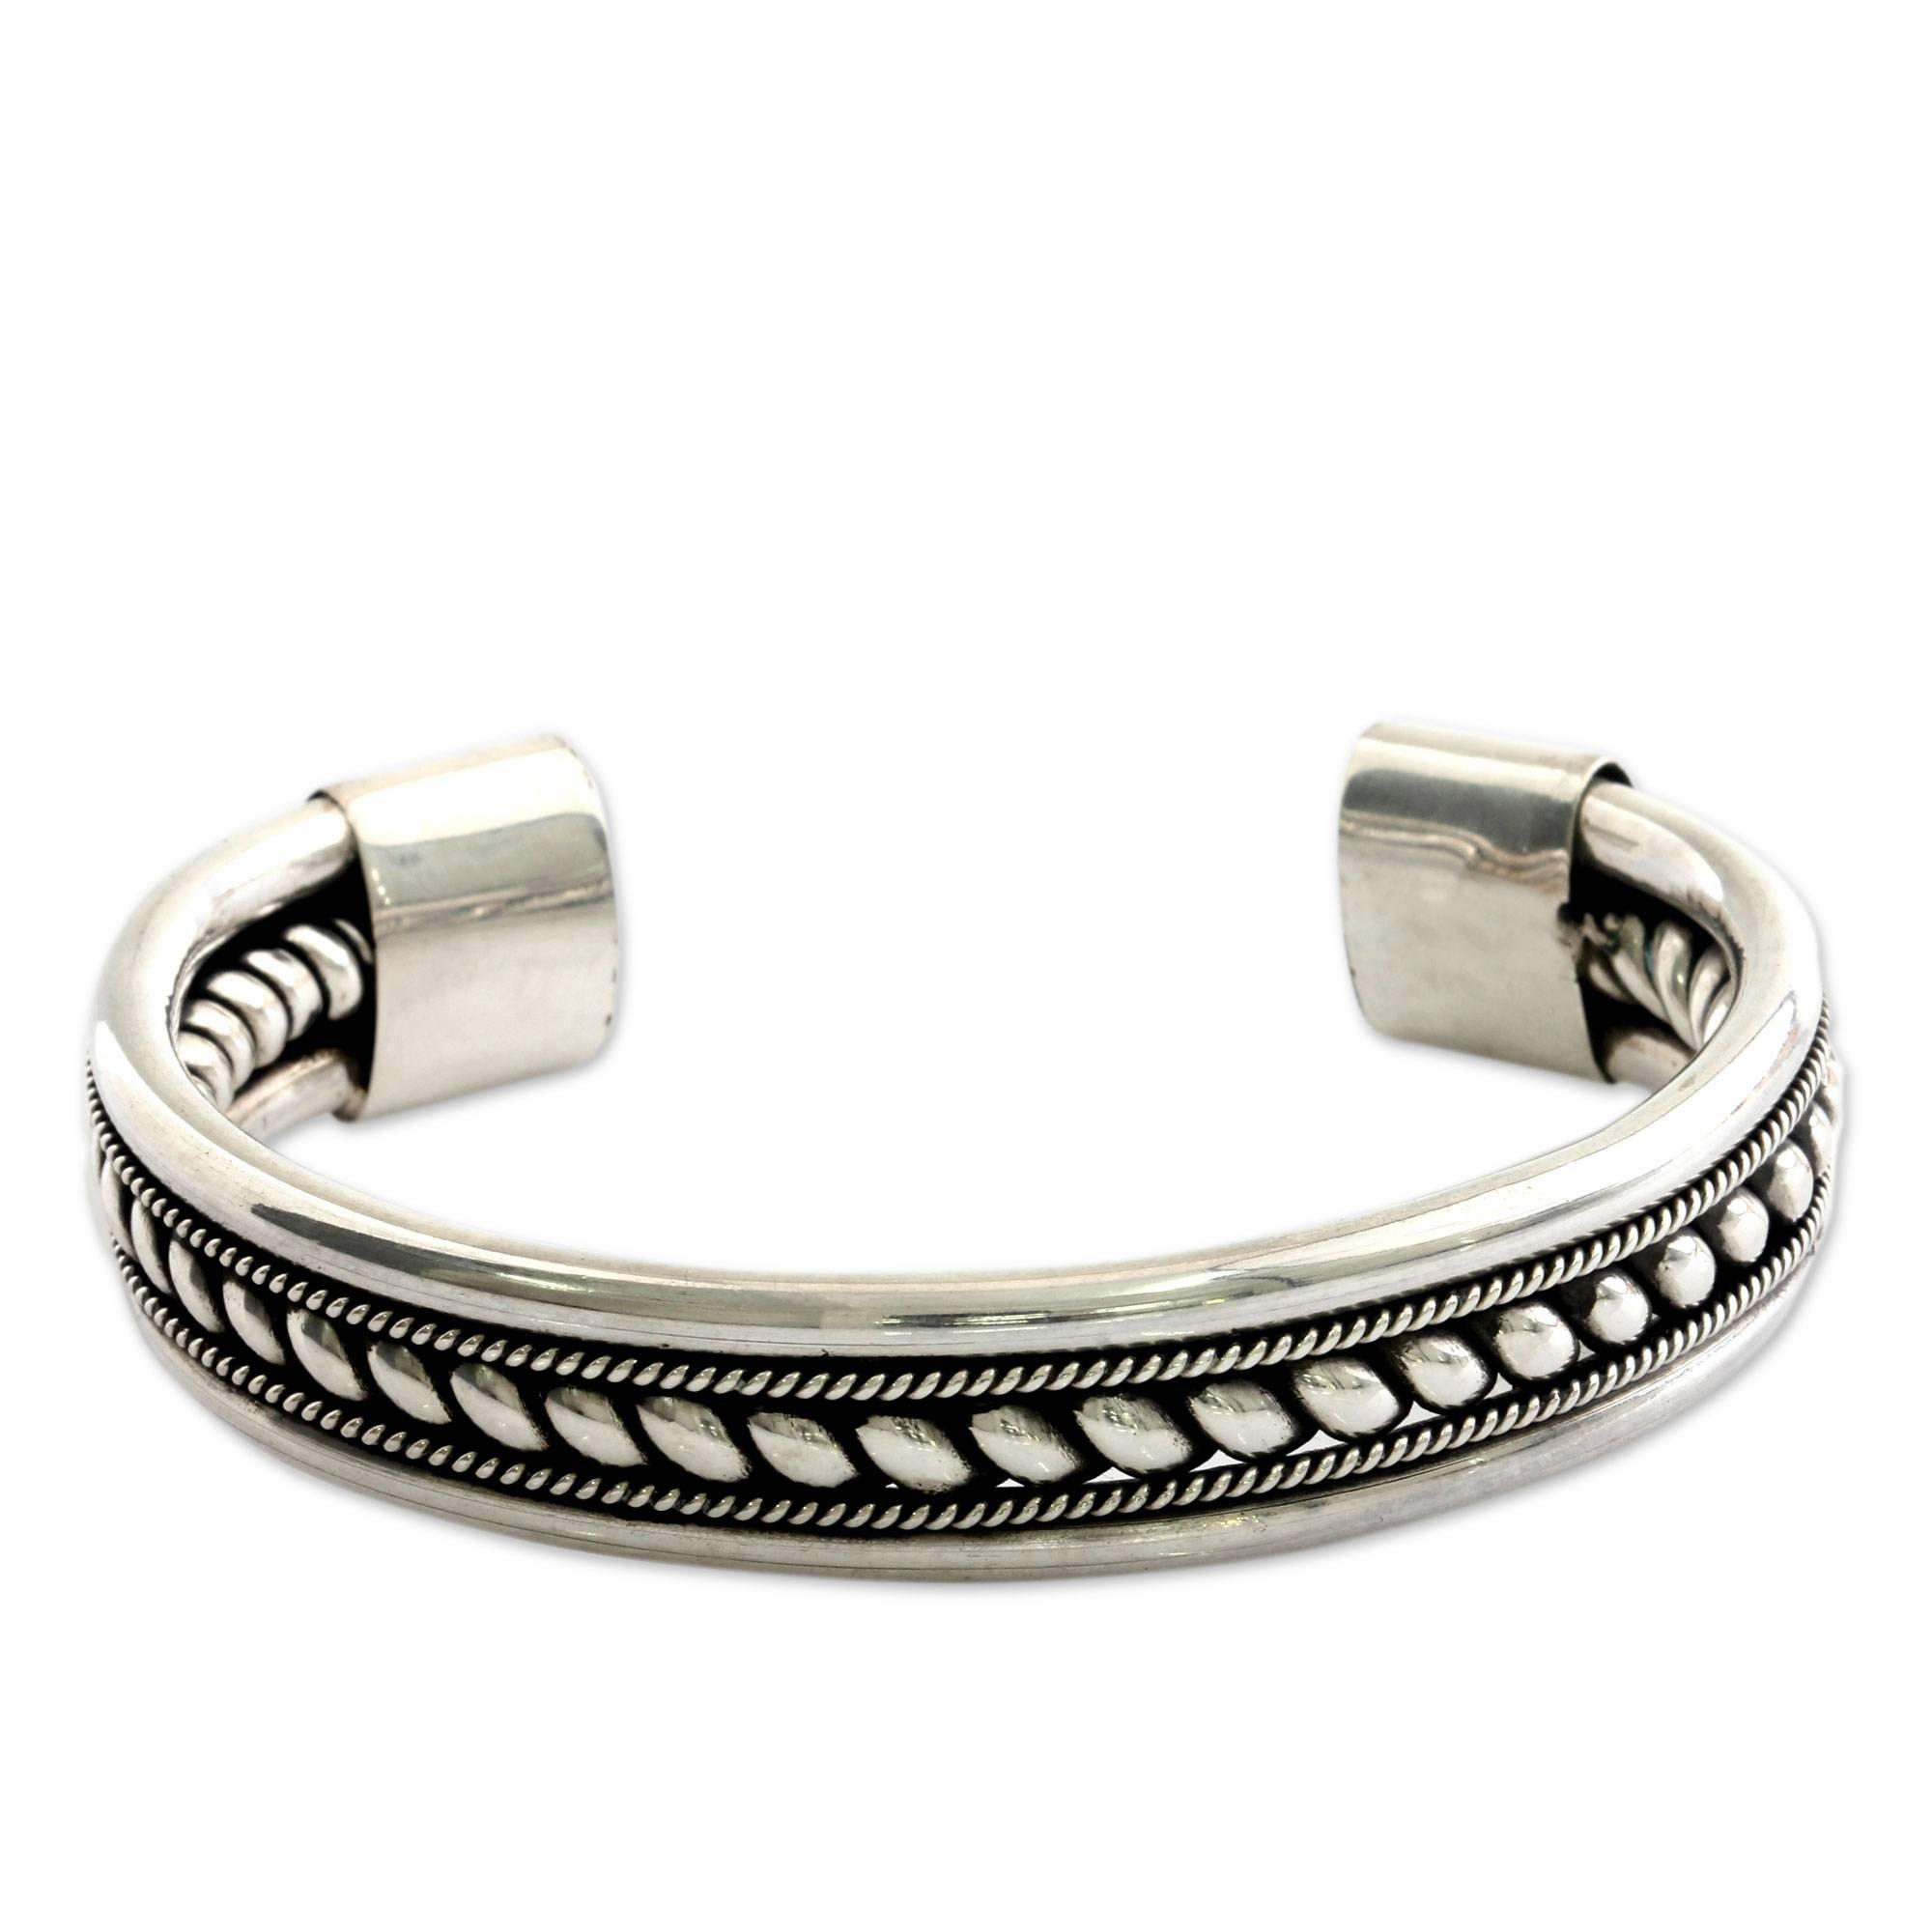 NOVICA .925 Sterling Silver Twist Motif Cuff Bracelet, 6.0'', Strength of Celuk'